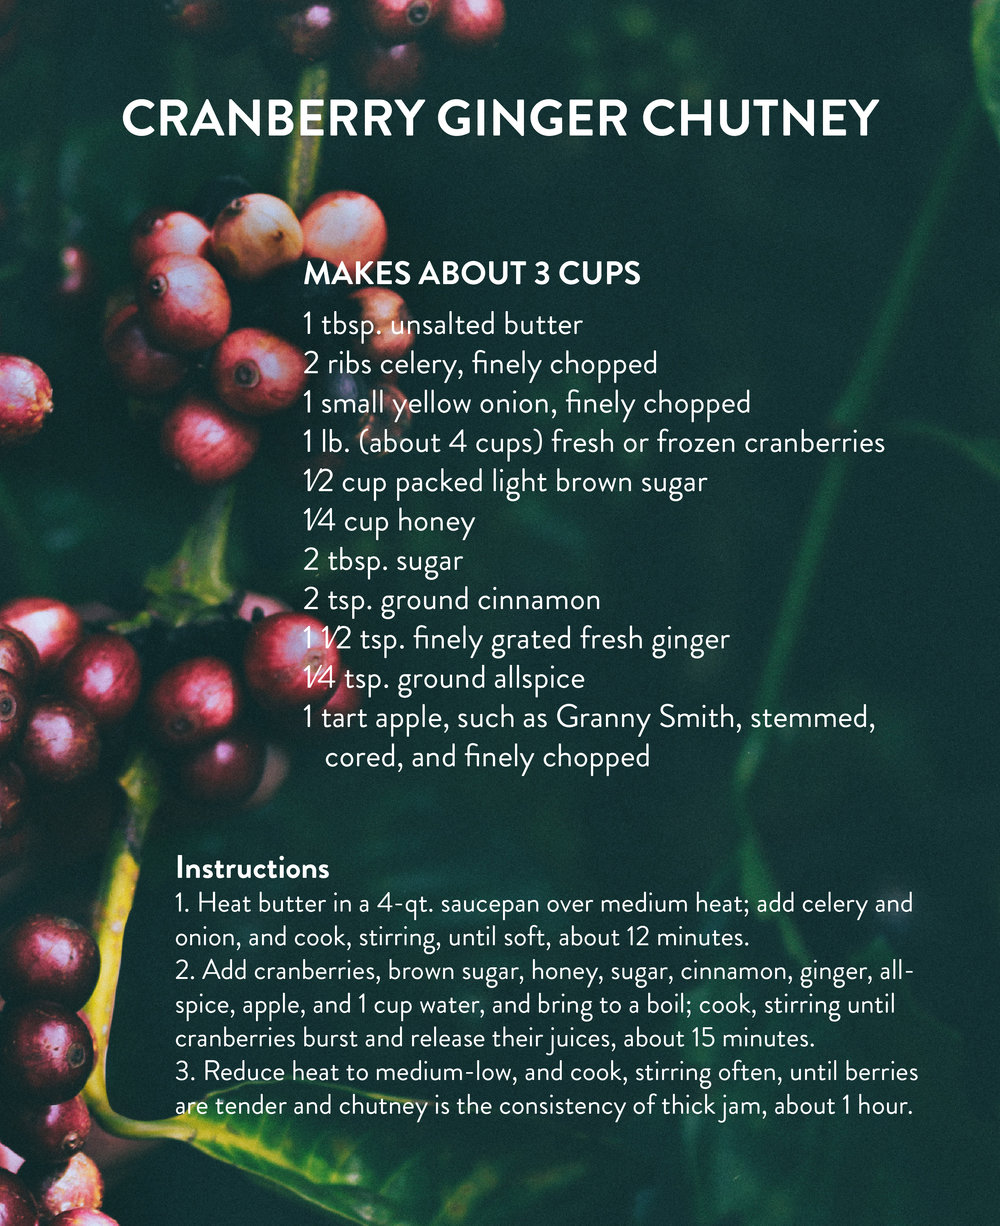 HH-Thanksgiving_CranberryChutney-instructions.jpg